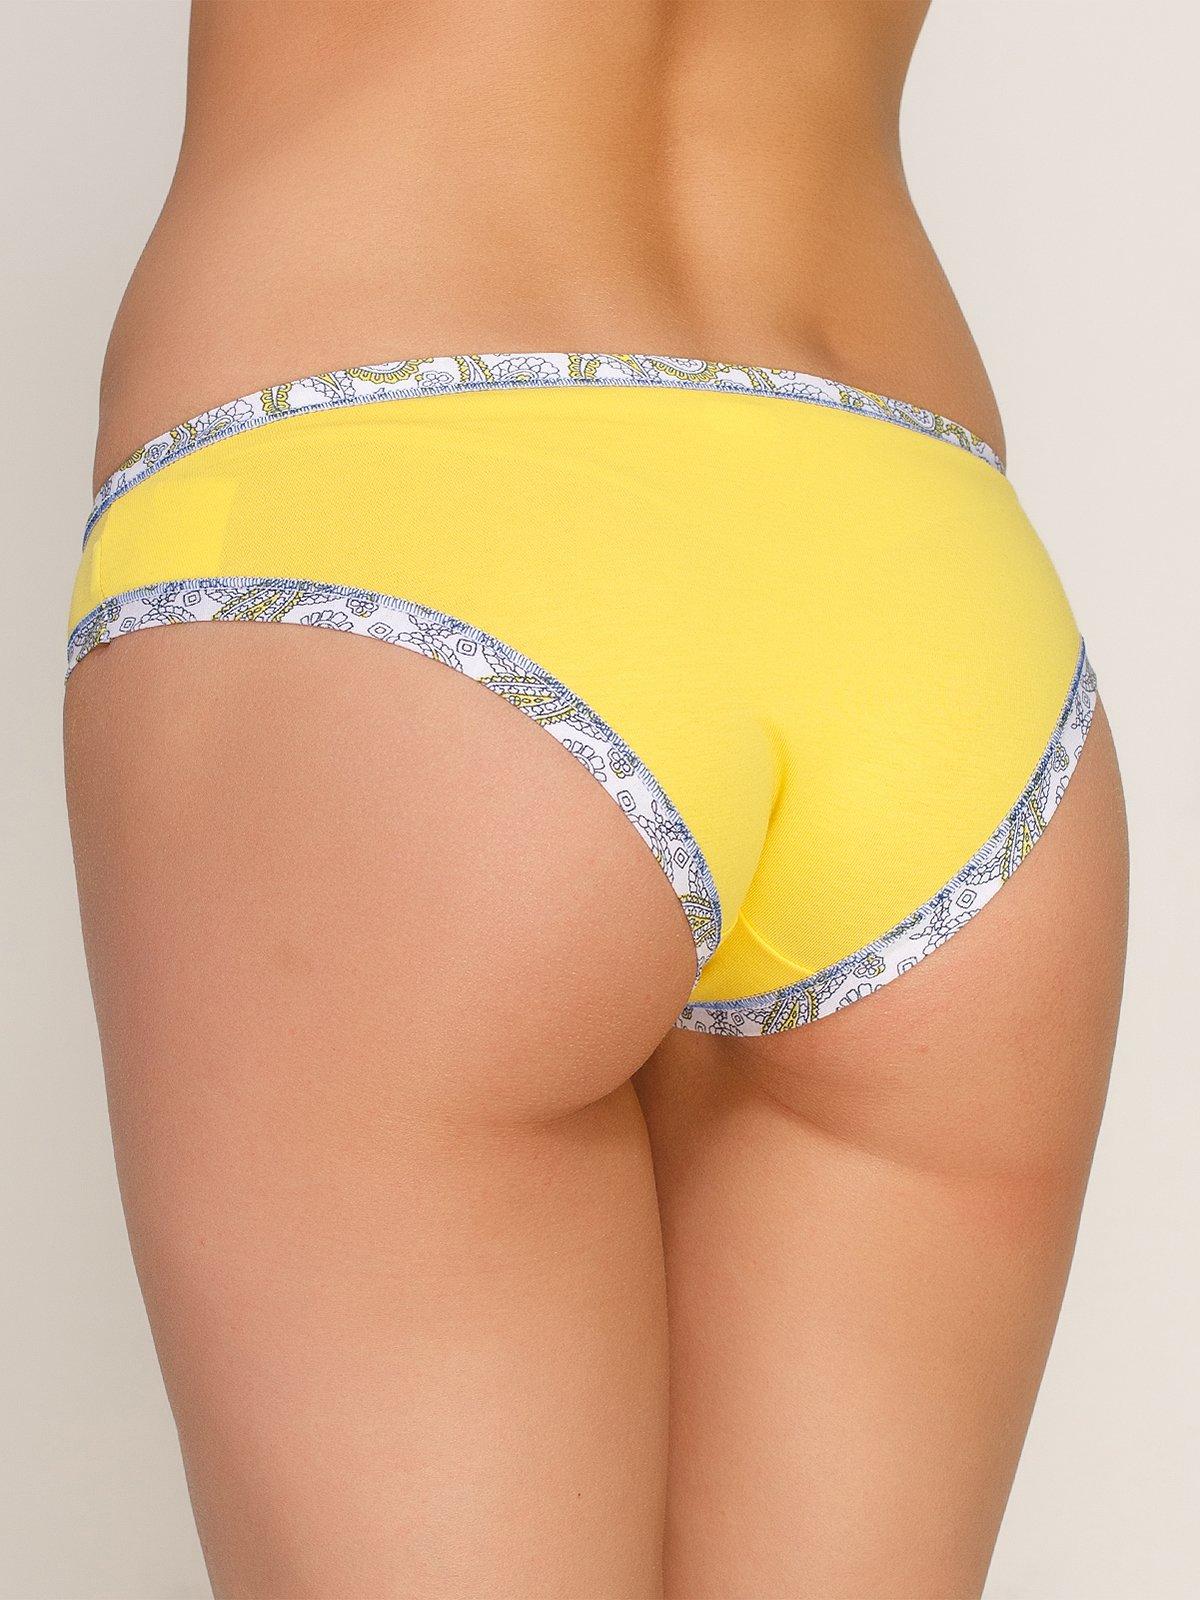 Желтые трусики фото — pic 5